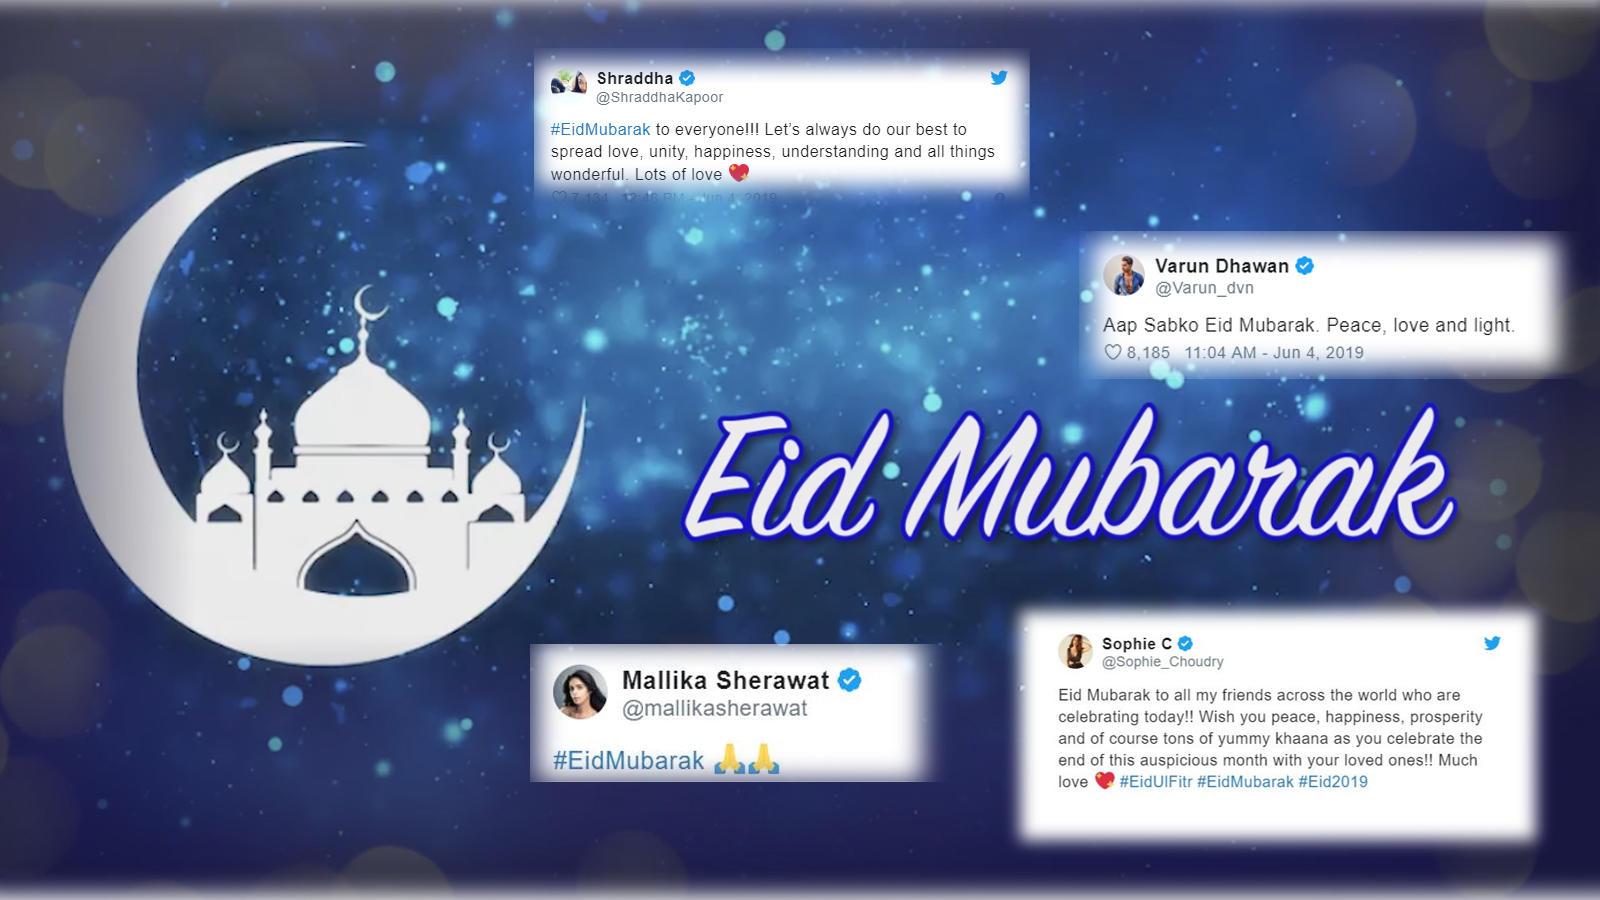 Happy Eid Ul Fitr 2019 Wishes Eid Mubarak Messages Status Images Video From Shraddha Kapoor To Mallika Sherawat Bollywood Wishes All Eid Mubarak